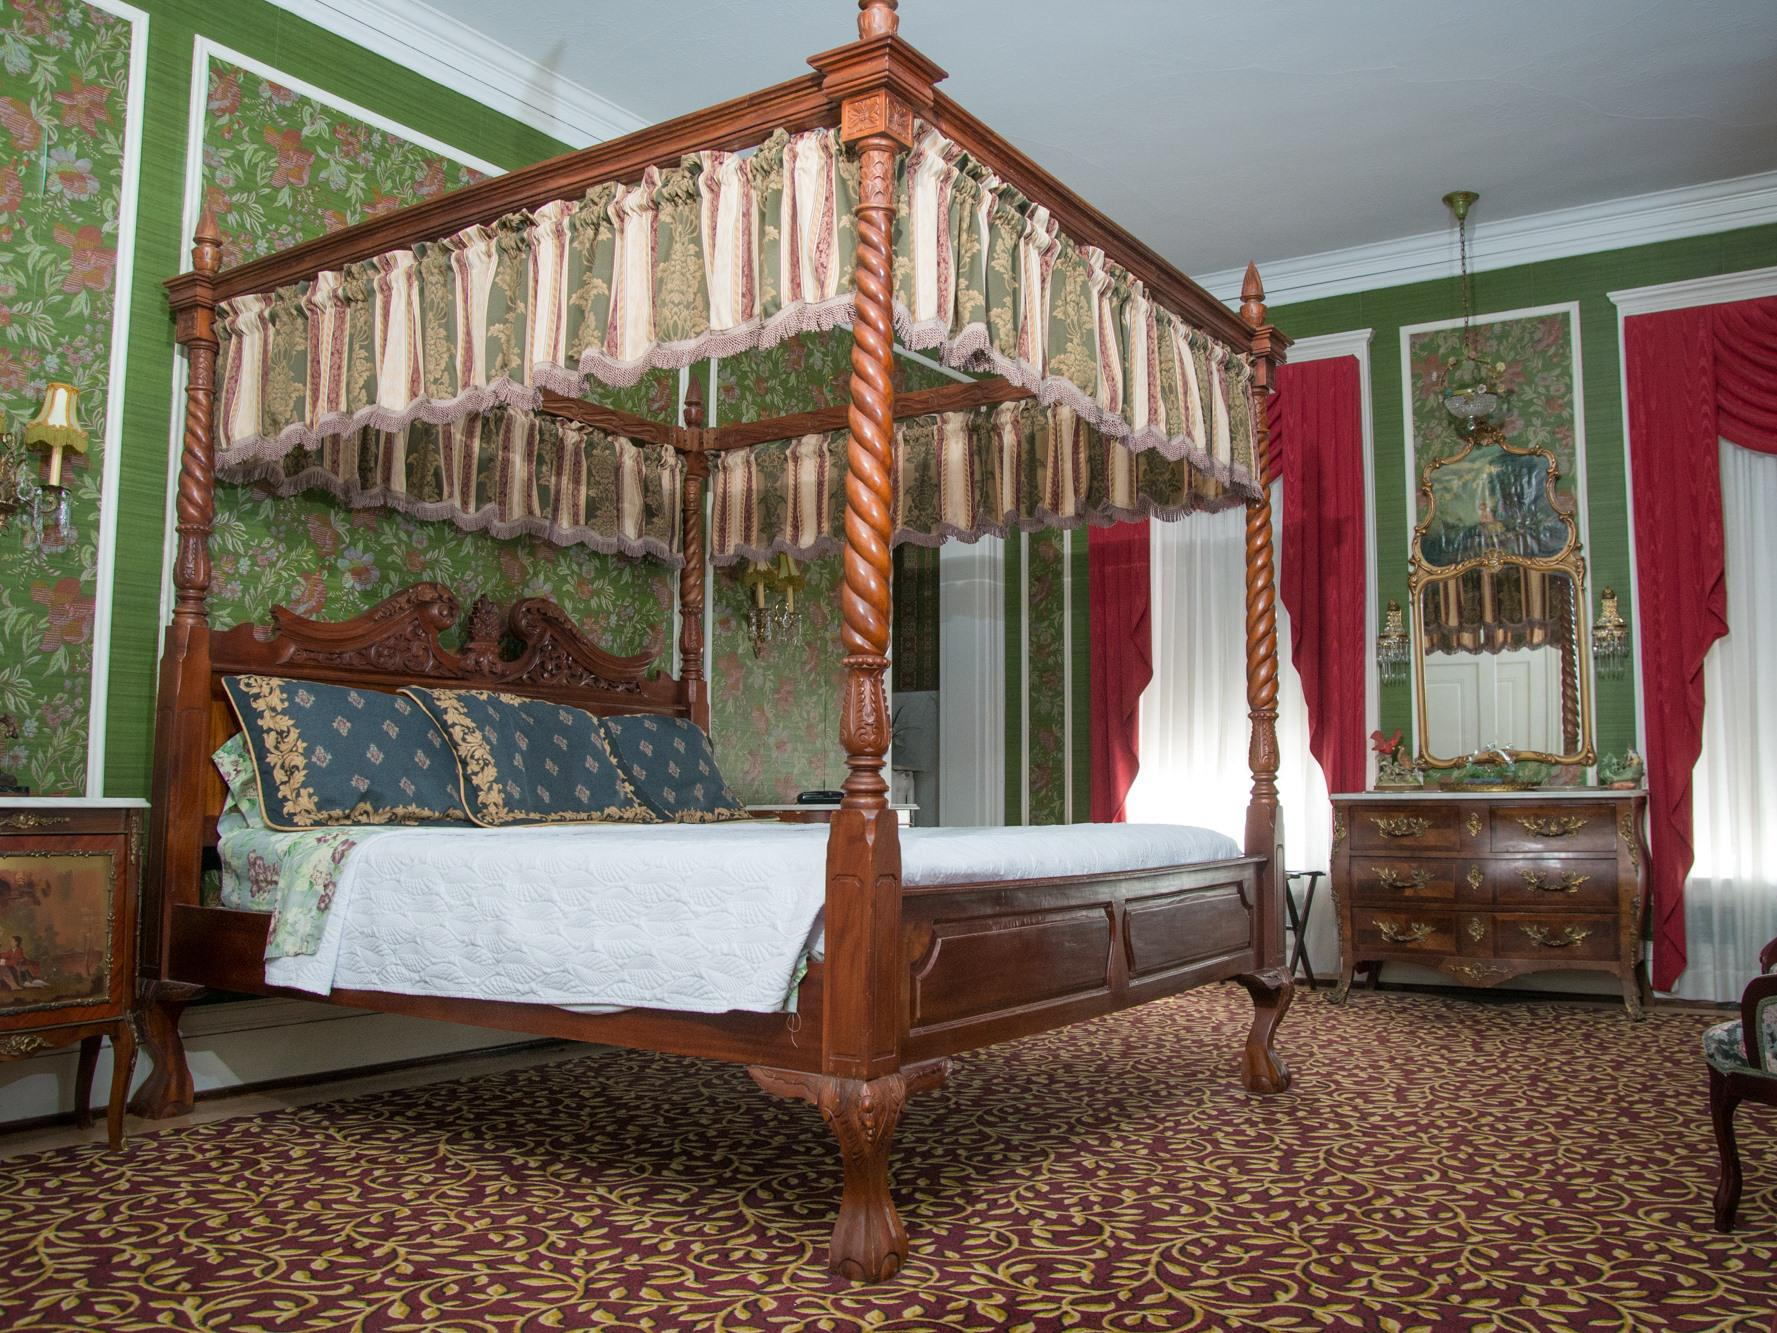 King-Ensuite-Presidential-The President's Room - Base Rate